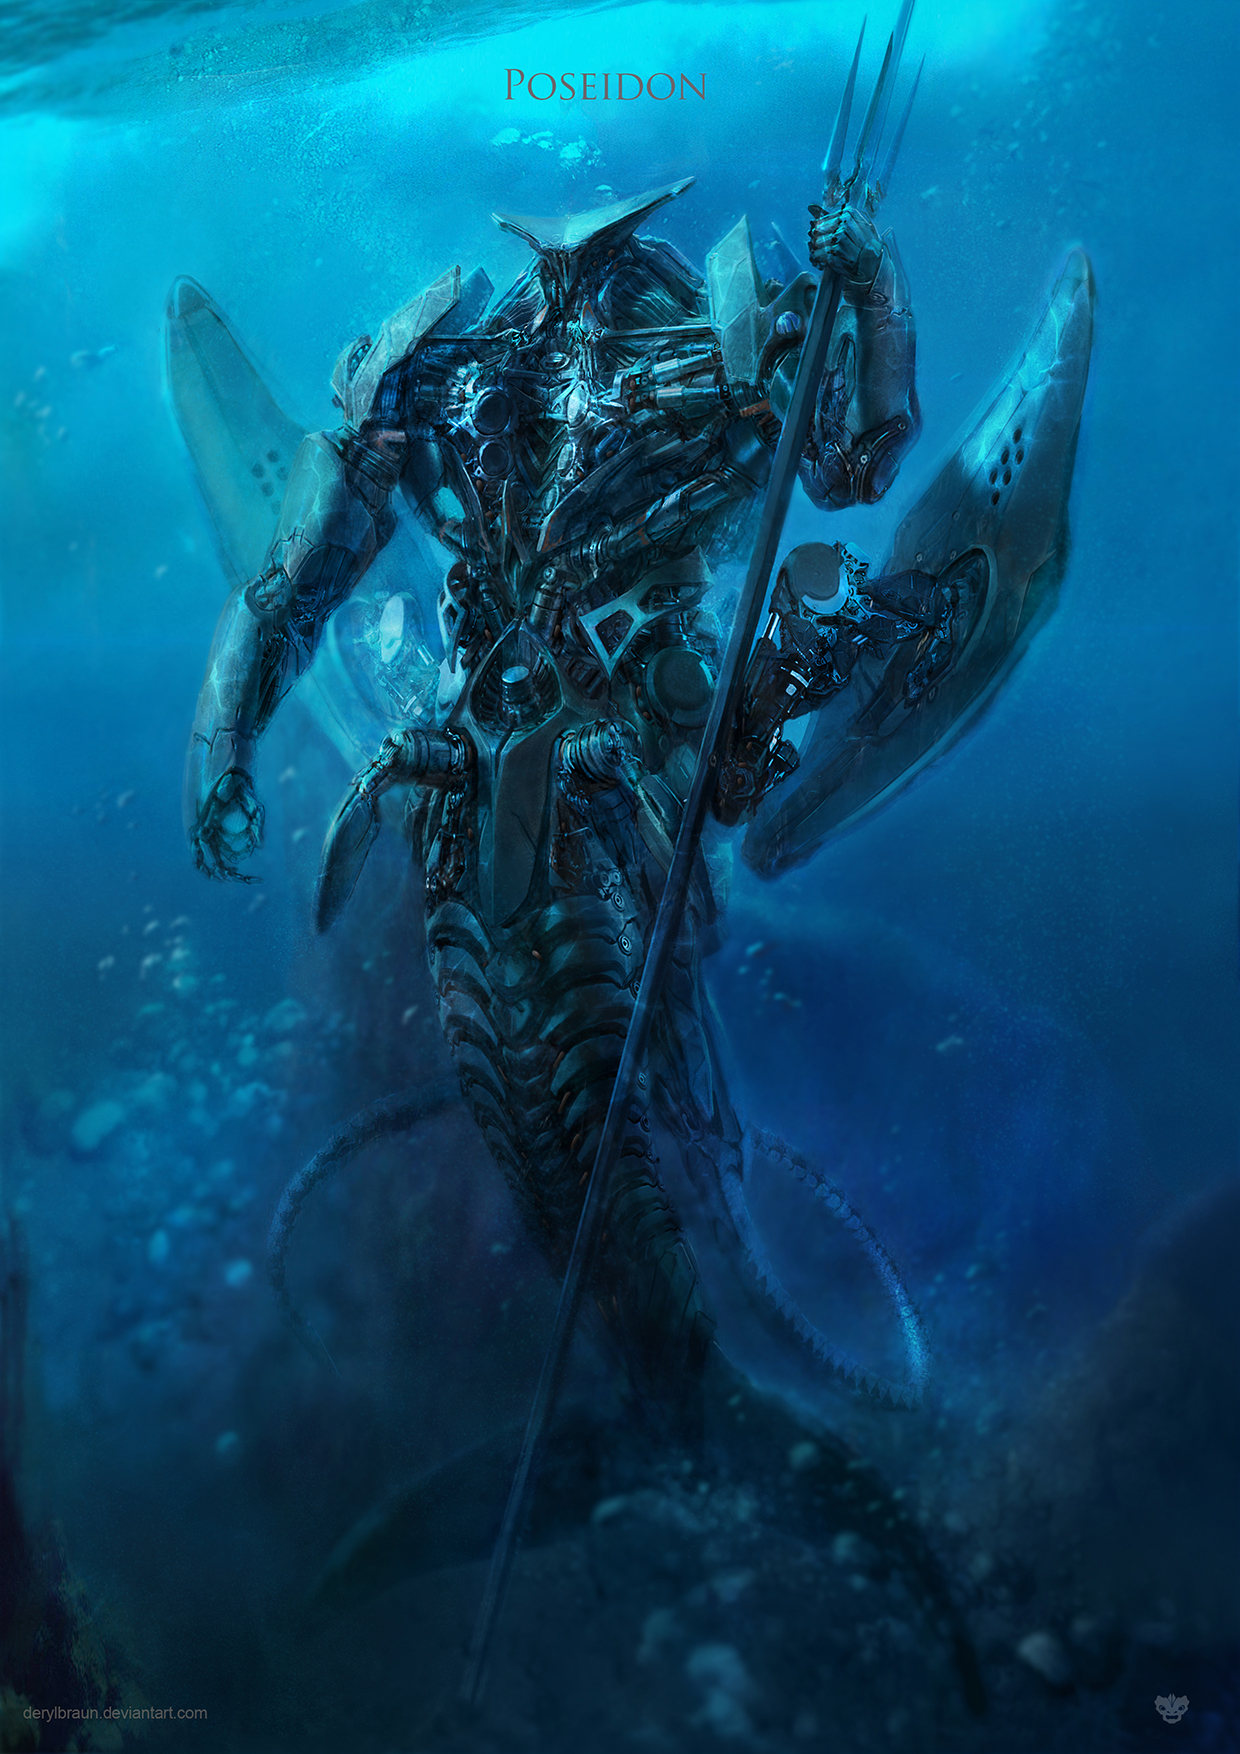 Poseidon by derylbraun